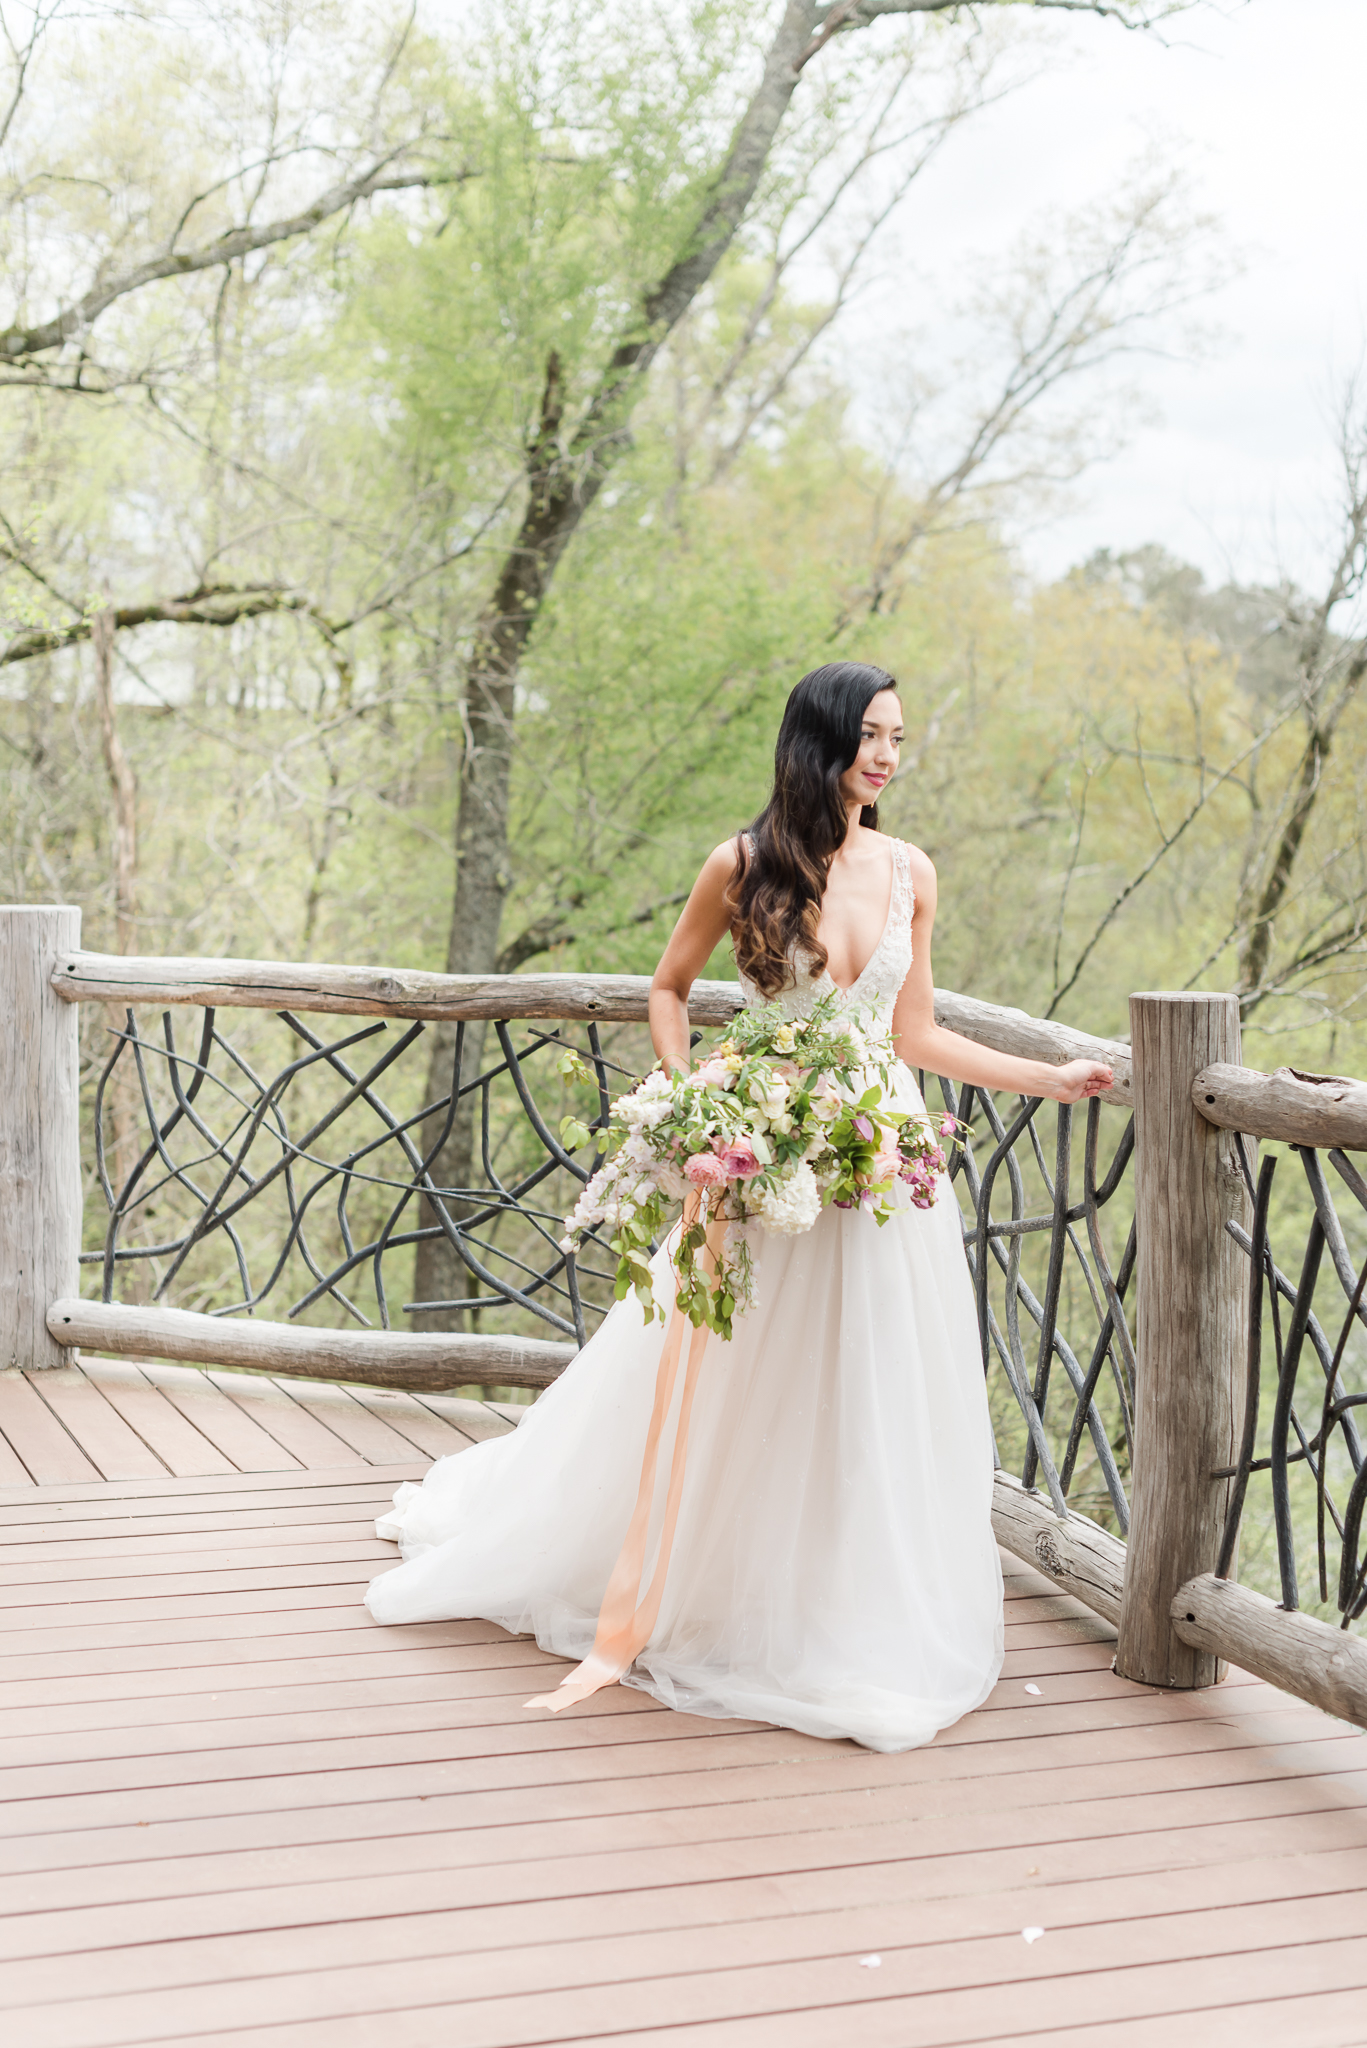 Wedding Day Bridal Portraits on the River-12.jpg